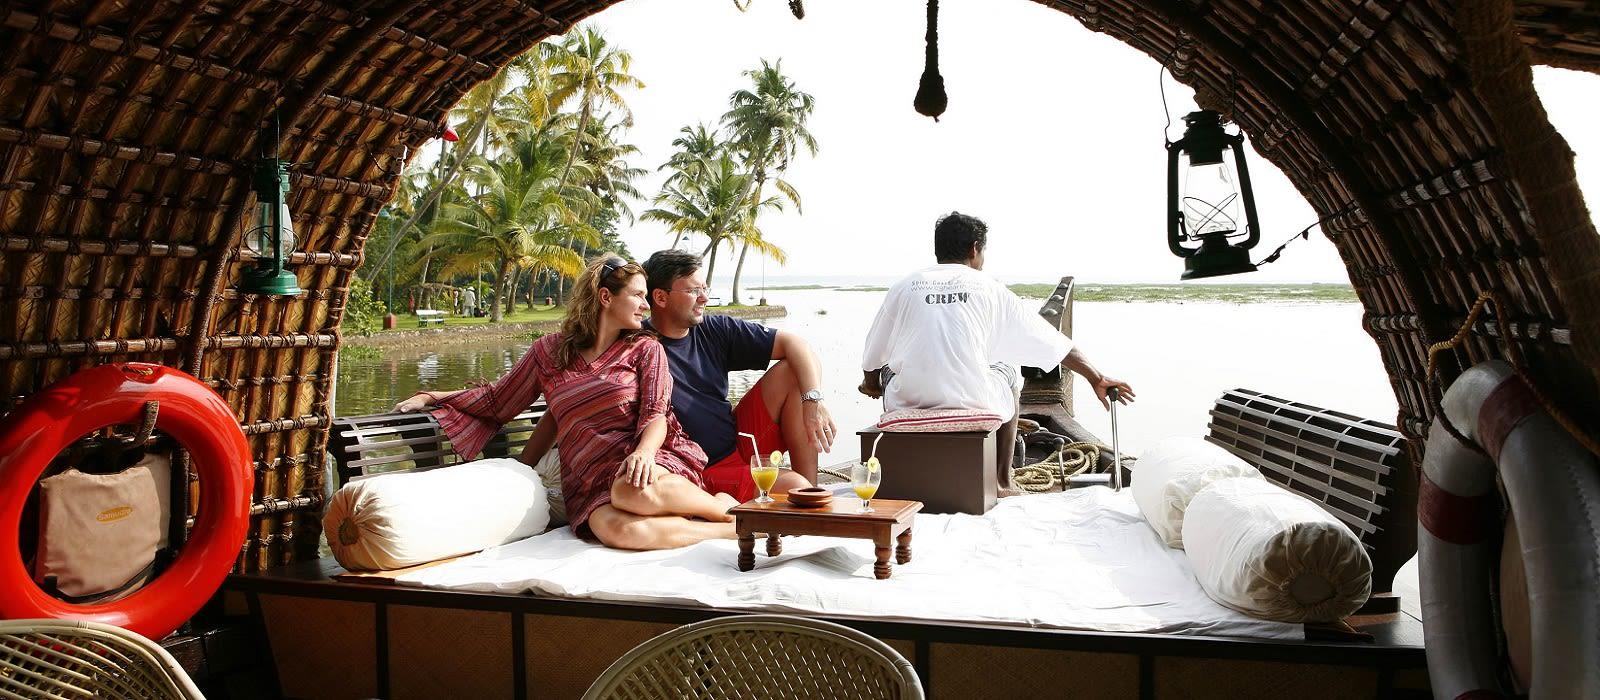 Kerala: Aromen, Traditionen & tropische Träume Urlaub 1